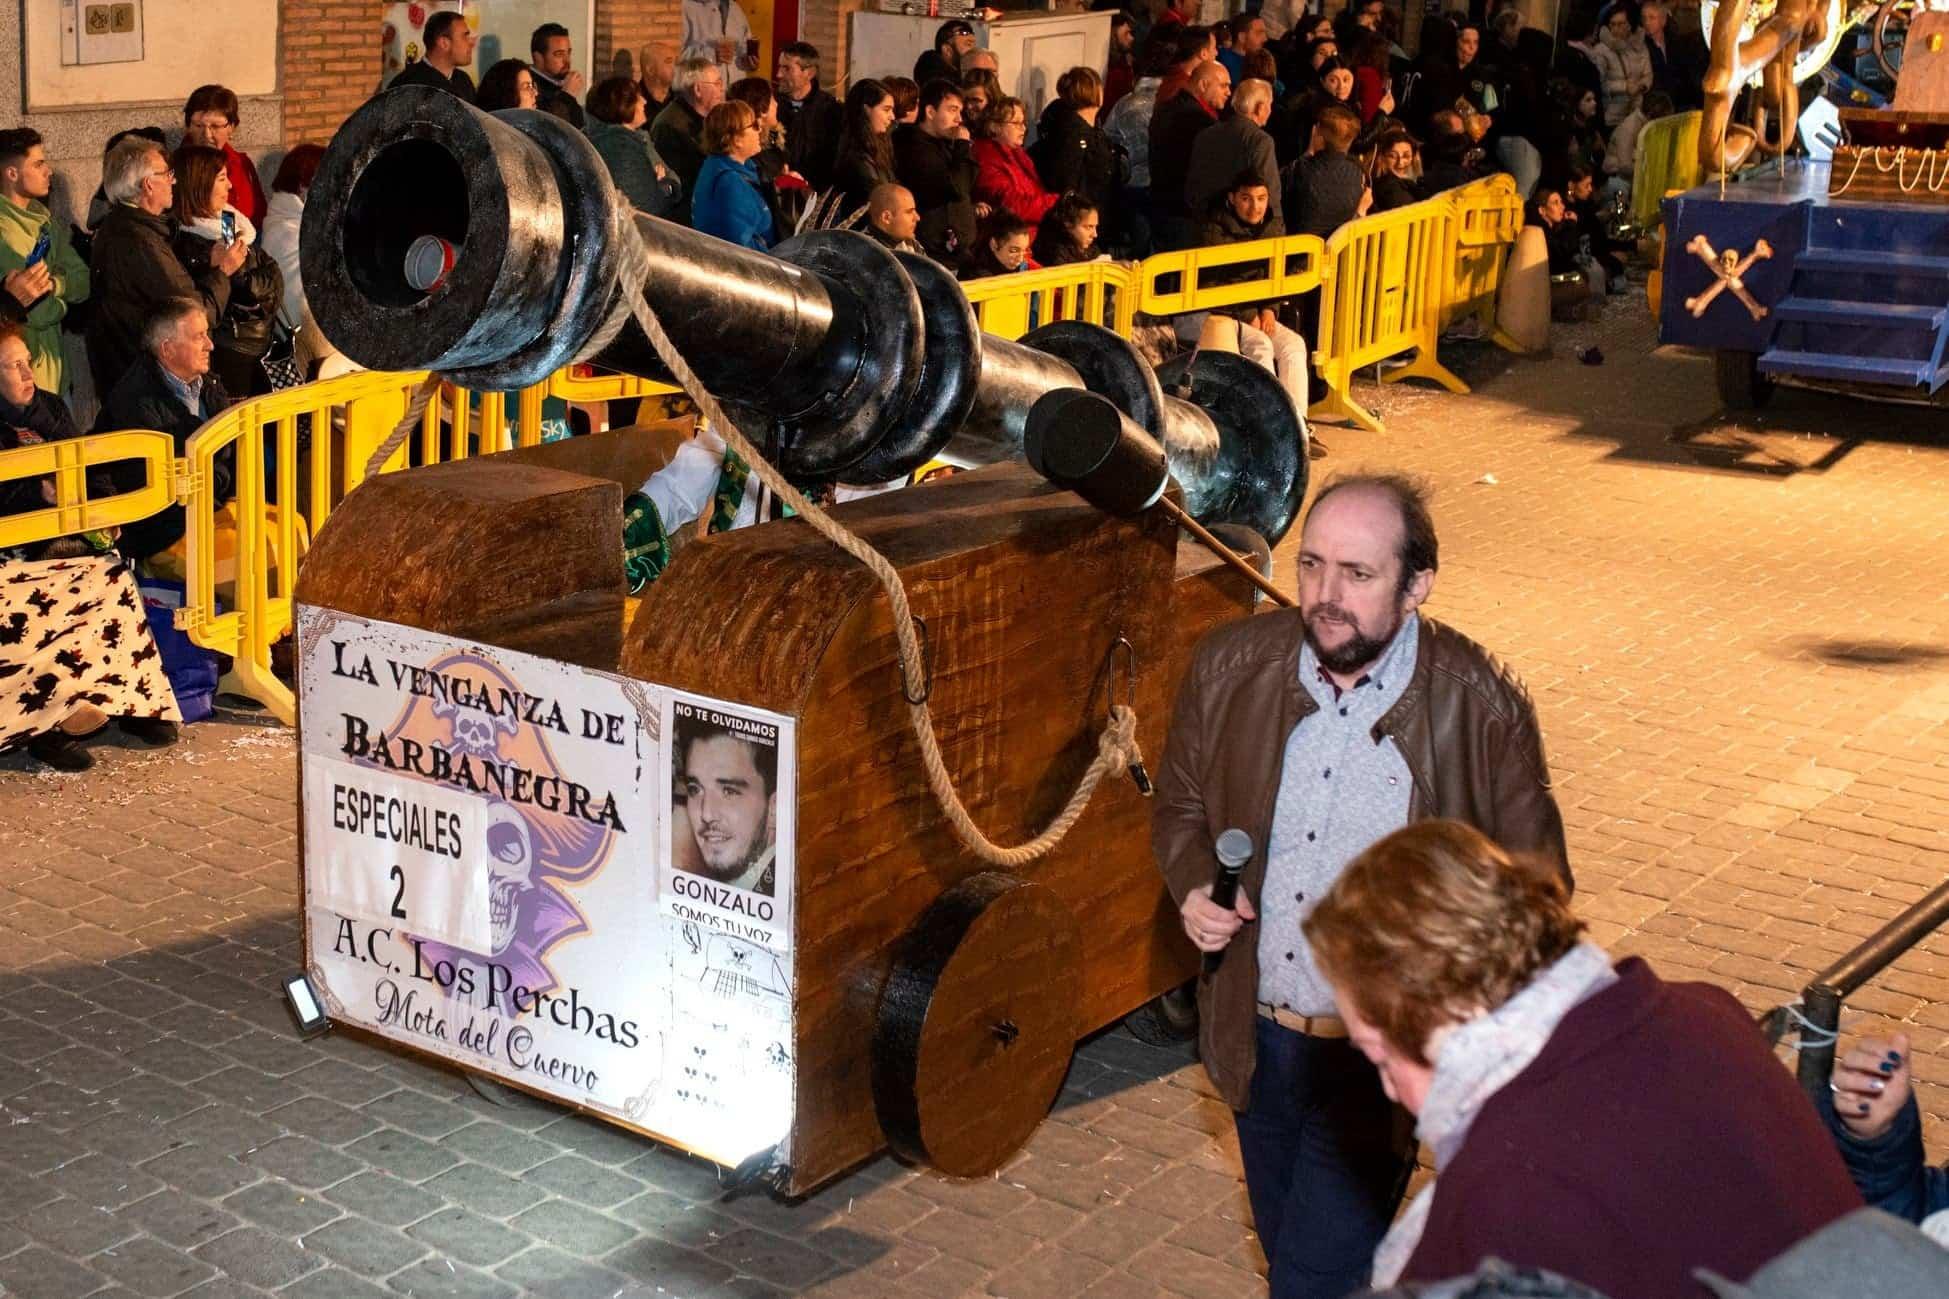 Carnaval de herencia 2020 ofertorio 170 - Selección de fotografías del Ofertorio del Carnaval de Herencia